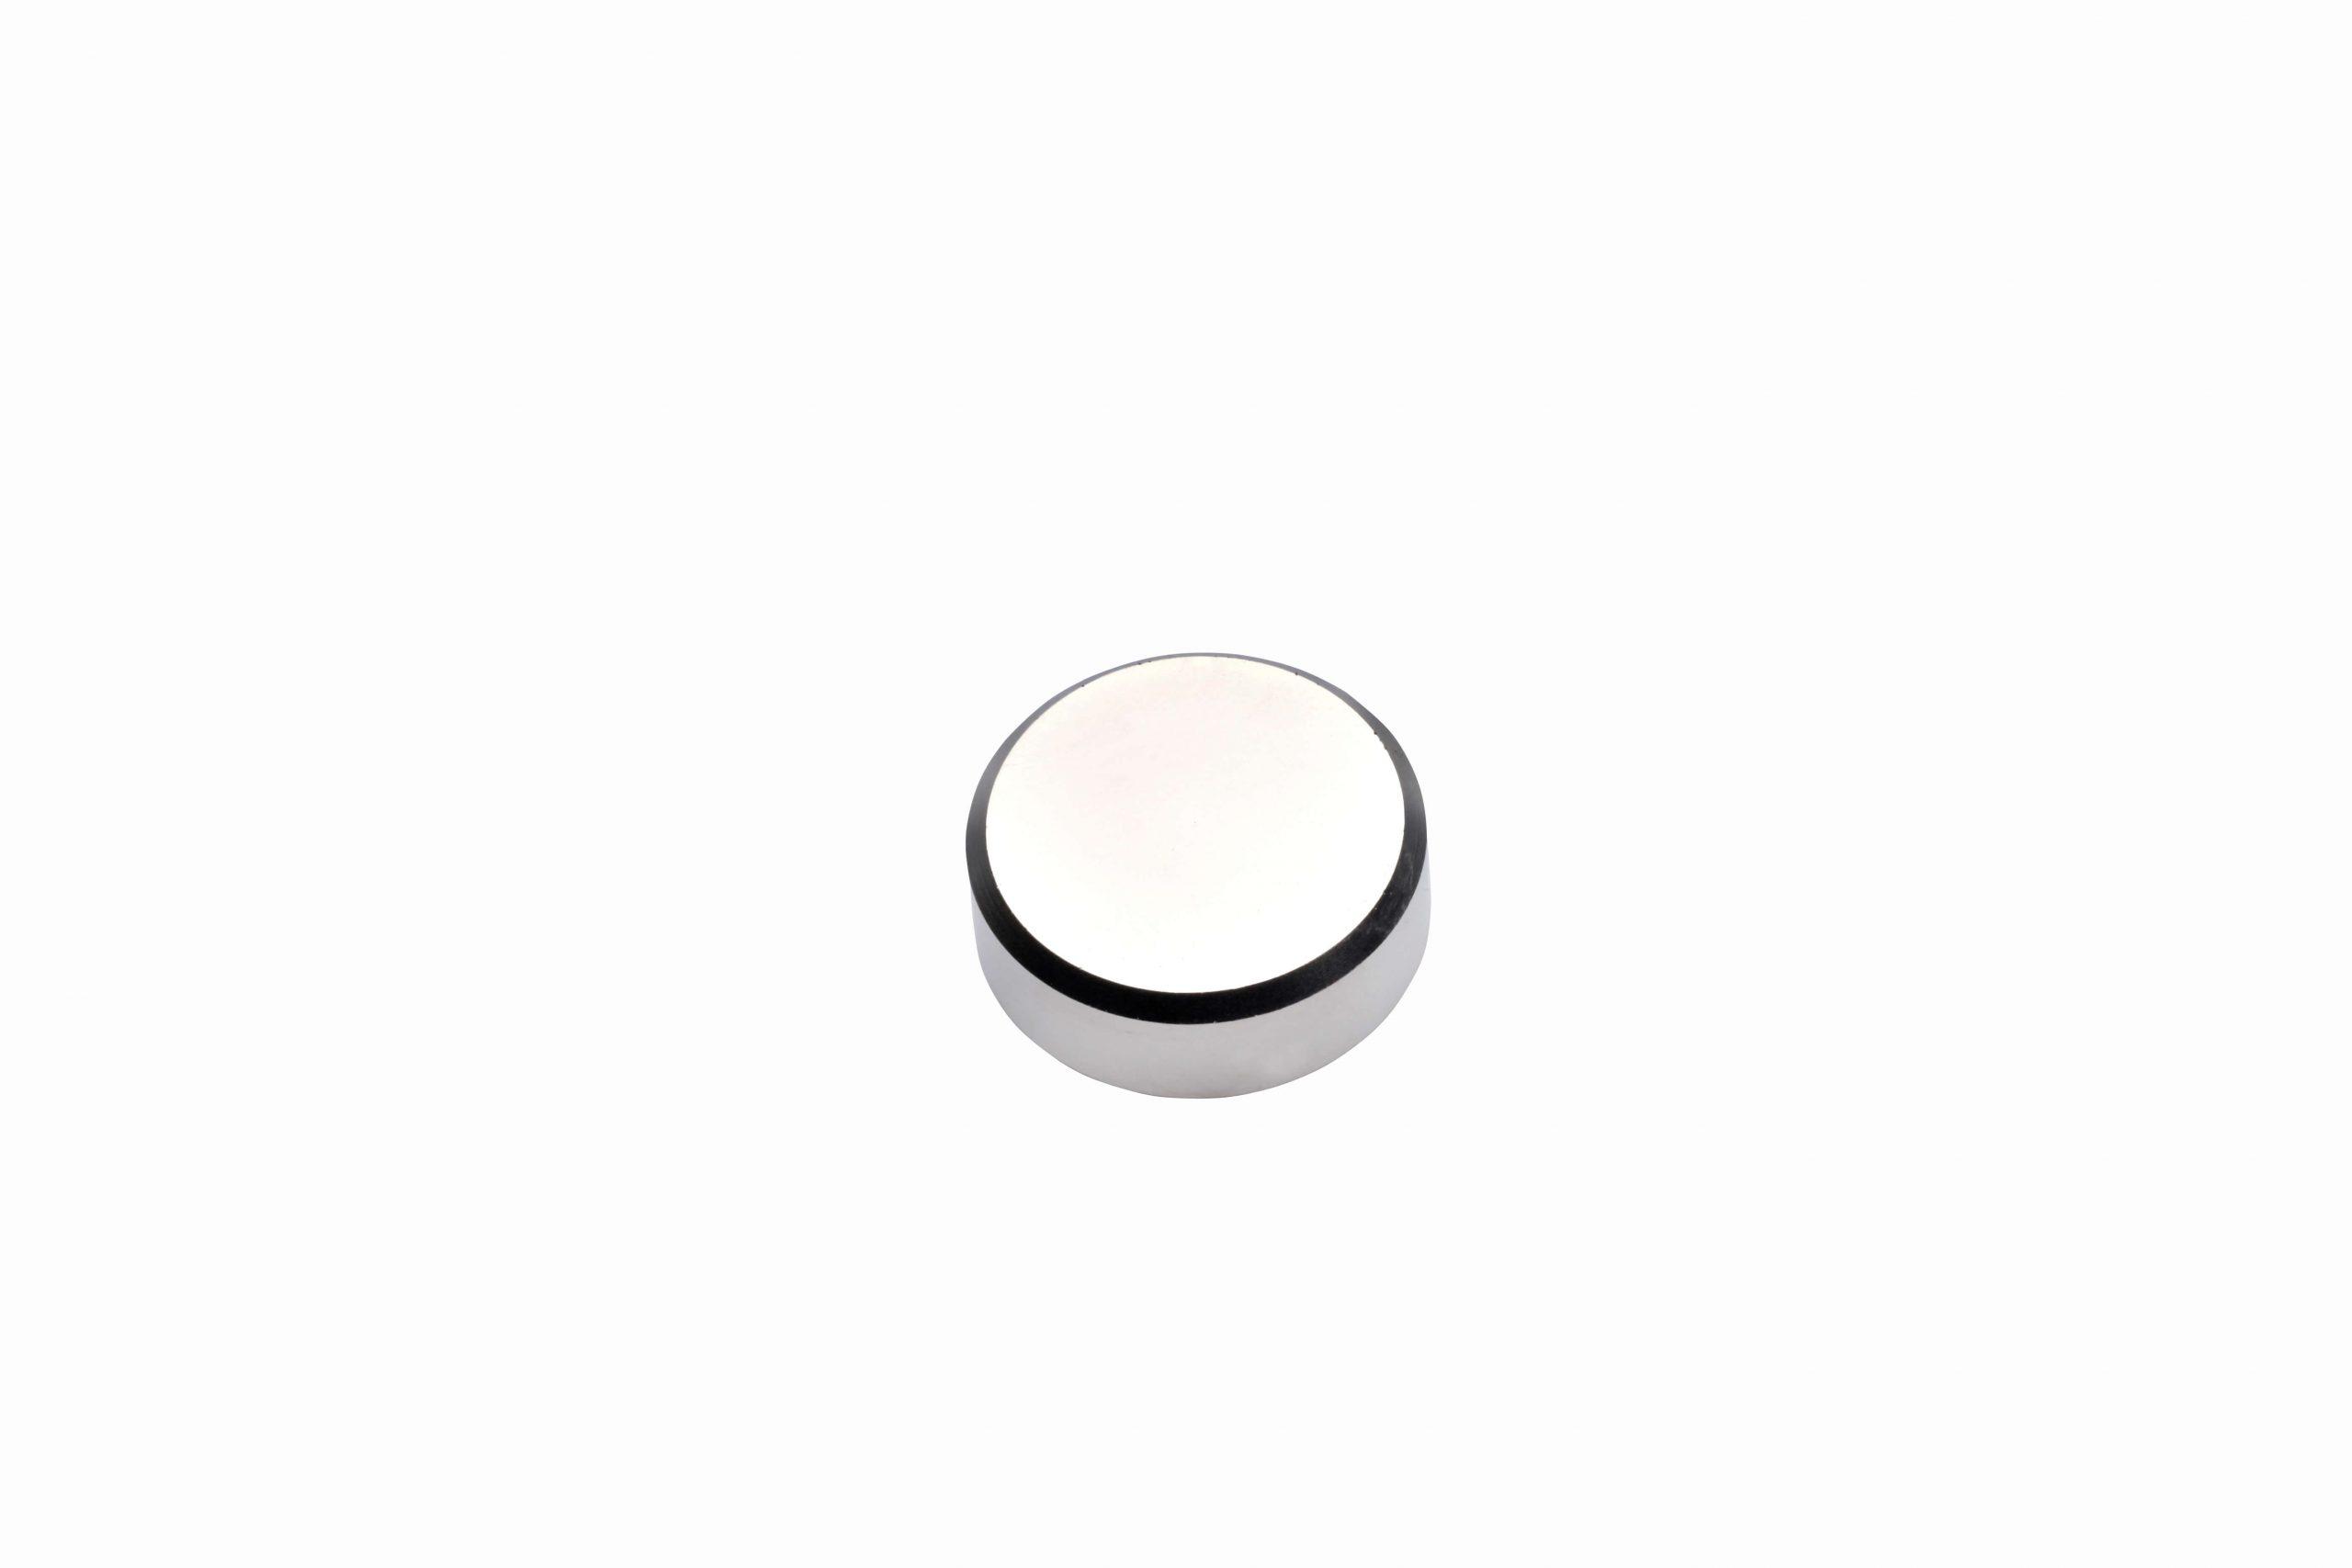 dentoprep lid for powder jar_www